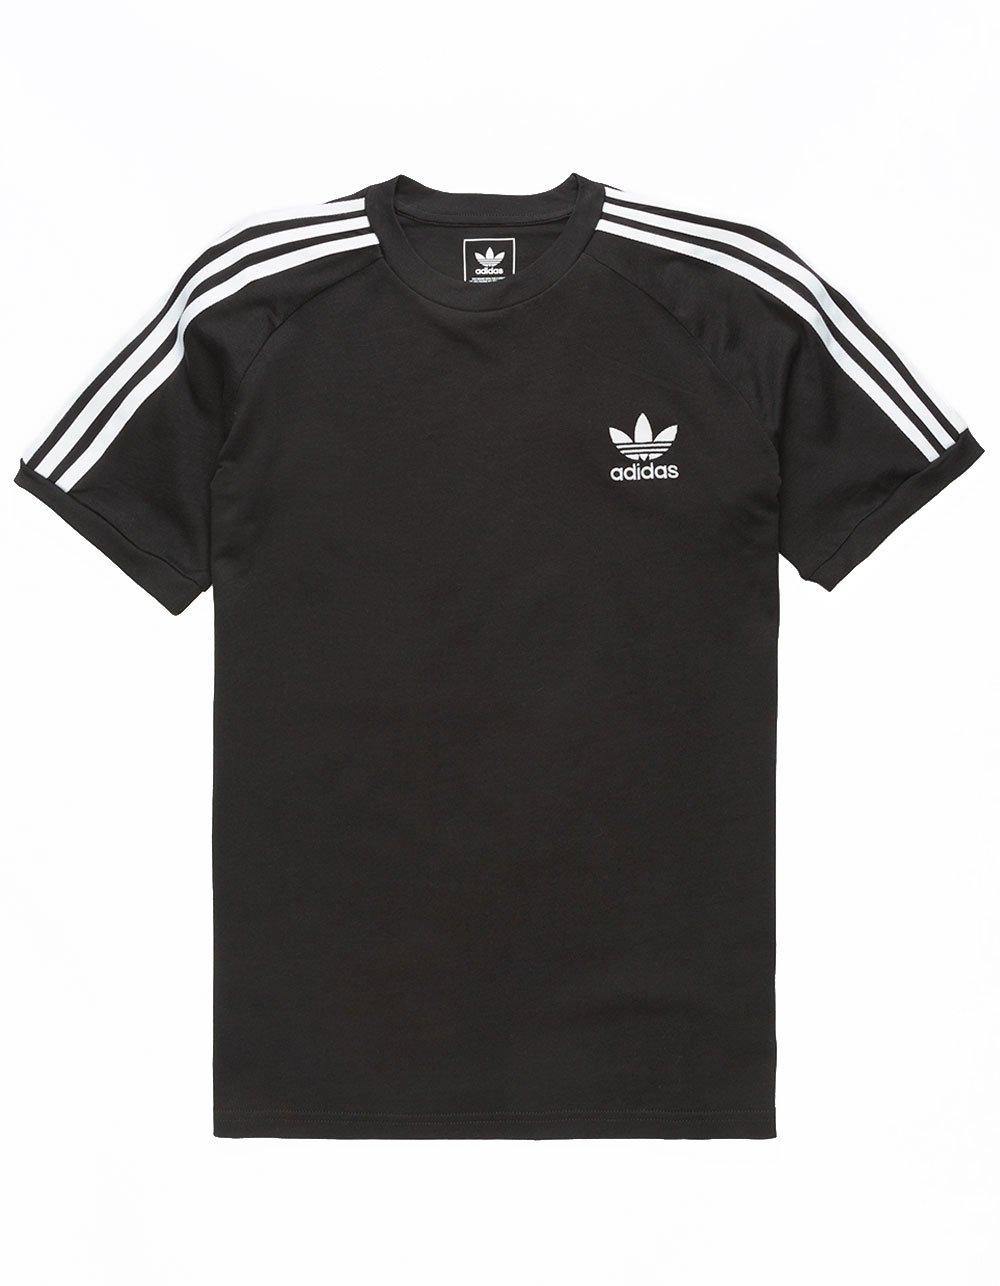 adidas Originals Boys' Big California Tee, Black/White, L